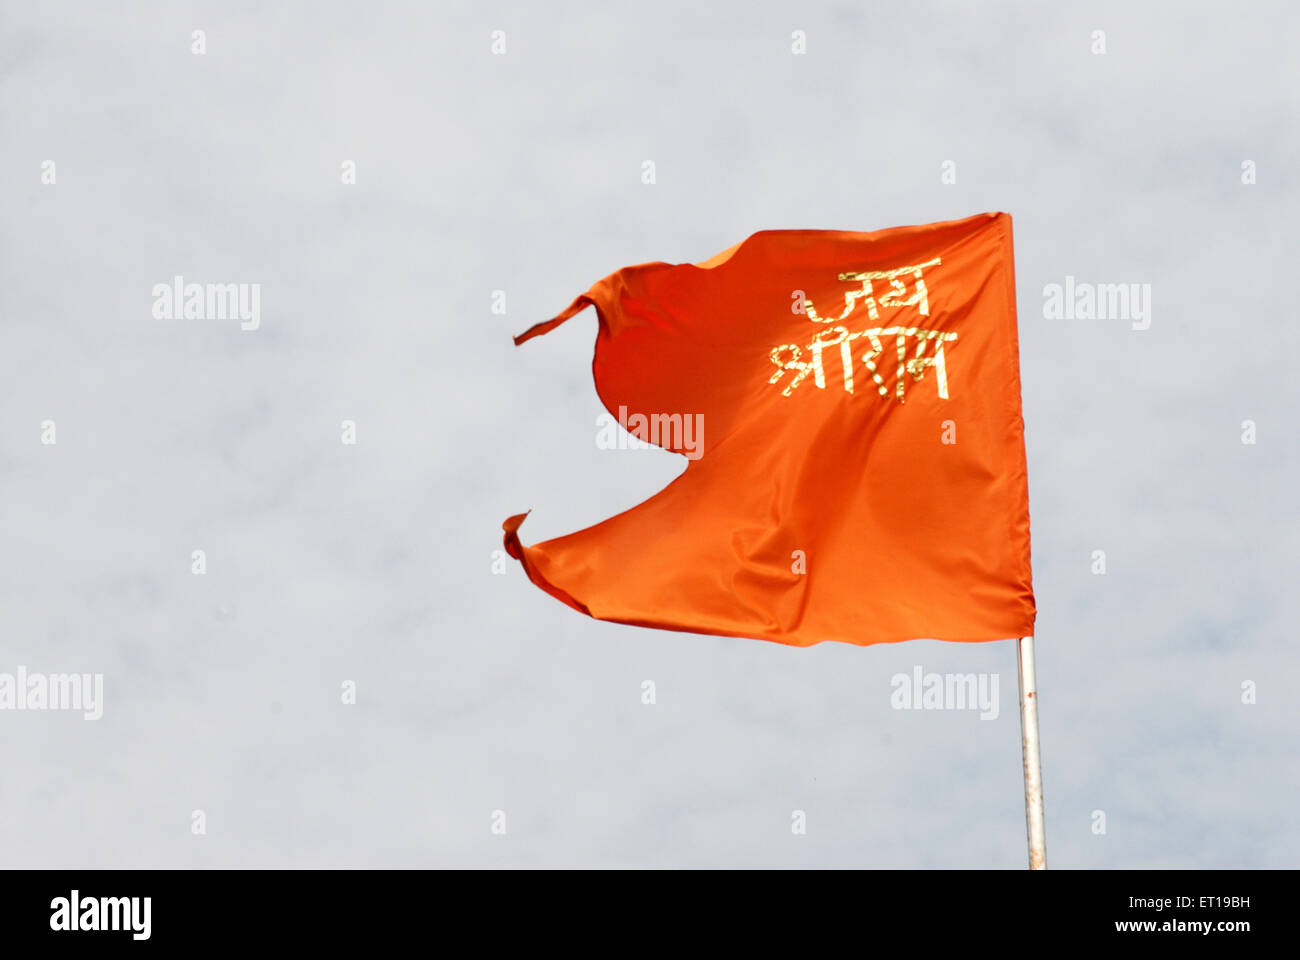 God Live Wallpaper Hd Orange Flag Name Of God Jay Shree Ram Stock Photo